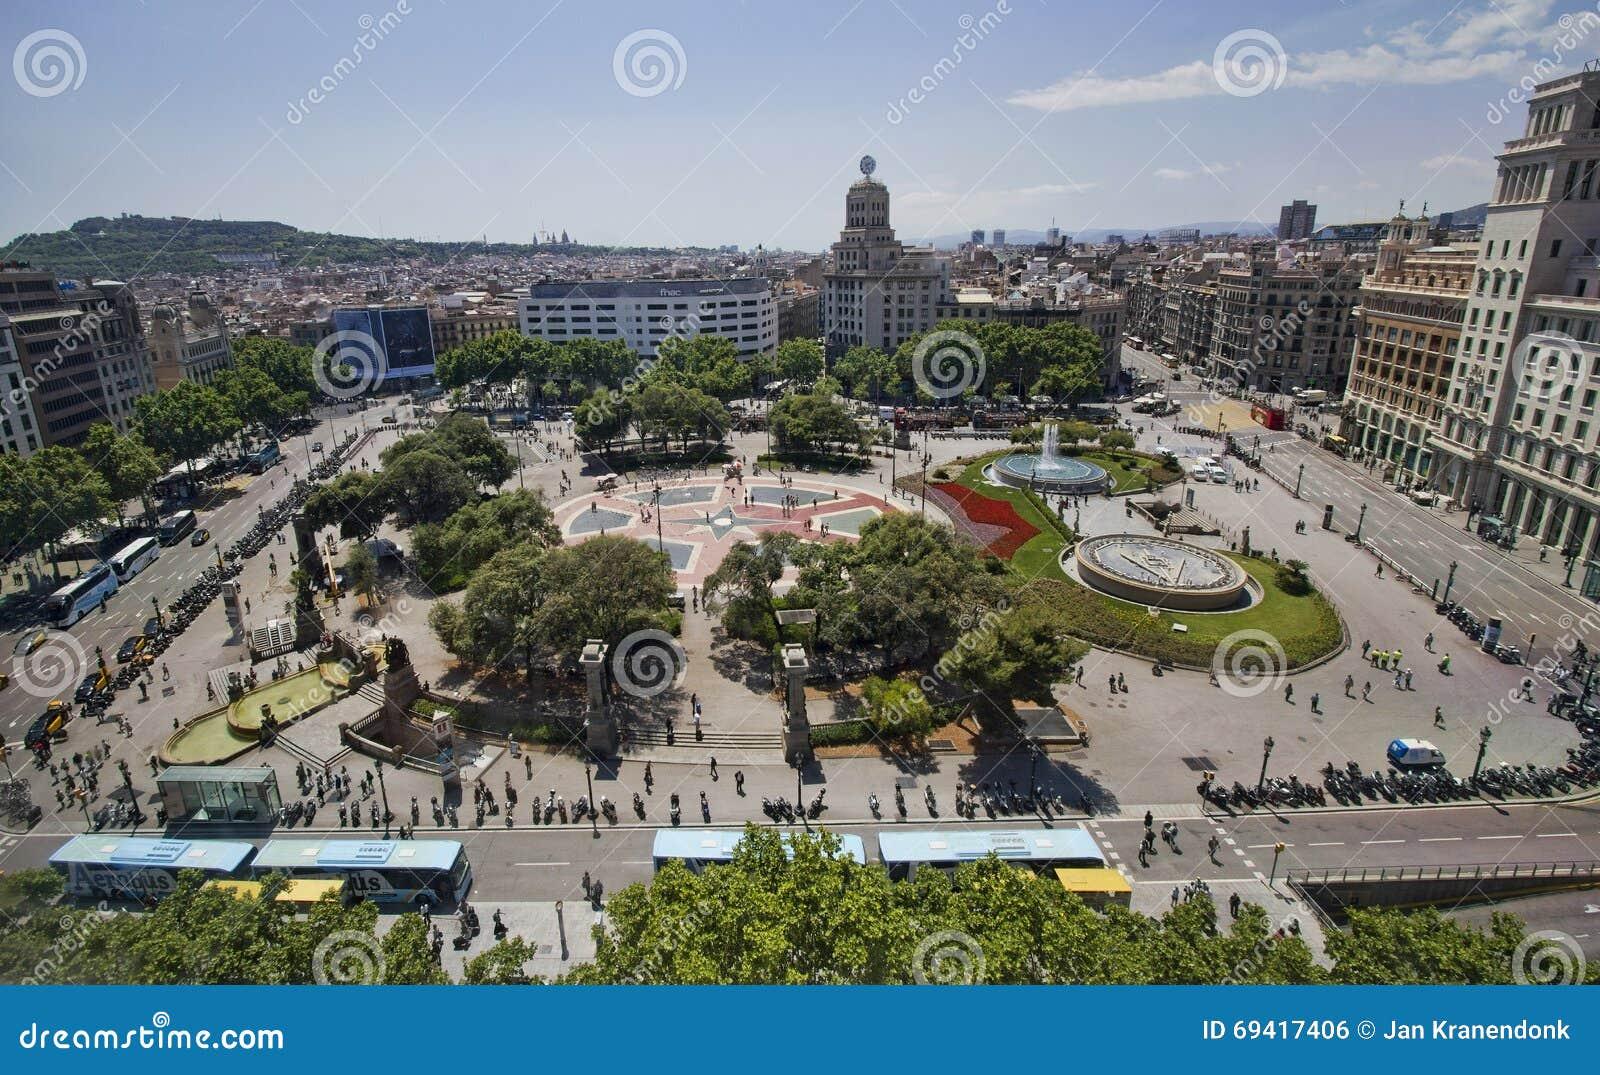 Placa catalunya barcelon editorial photo image of summer - Placa kennedy barcelona ...